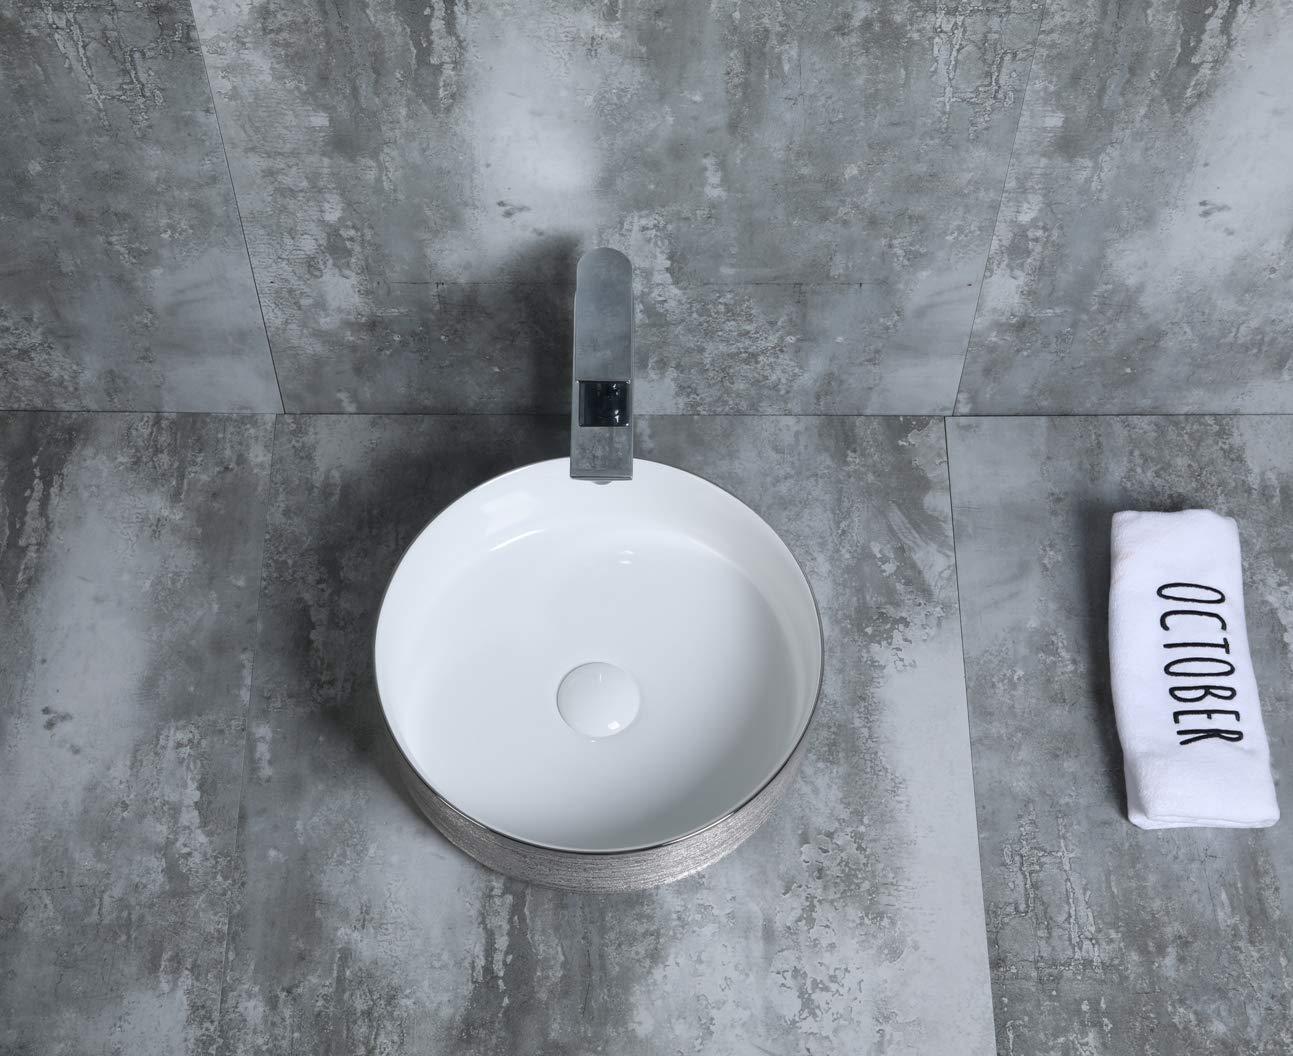 STARBATH PLUS Ceramic Countertop Basin Sink Washbasin Vessel SFINCIL 35 x 35 cm x 12 cm SILVER